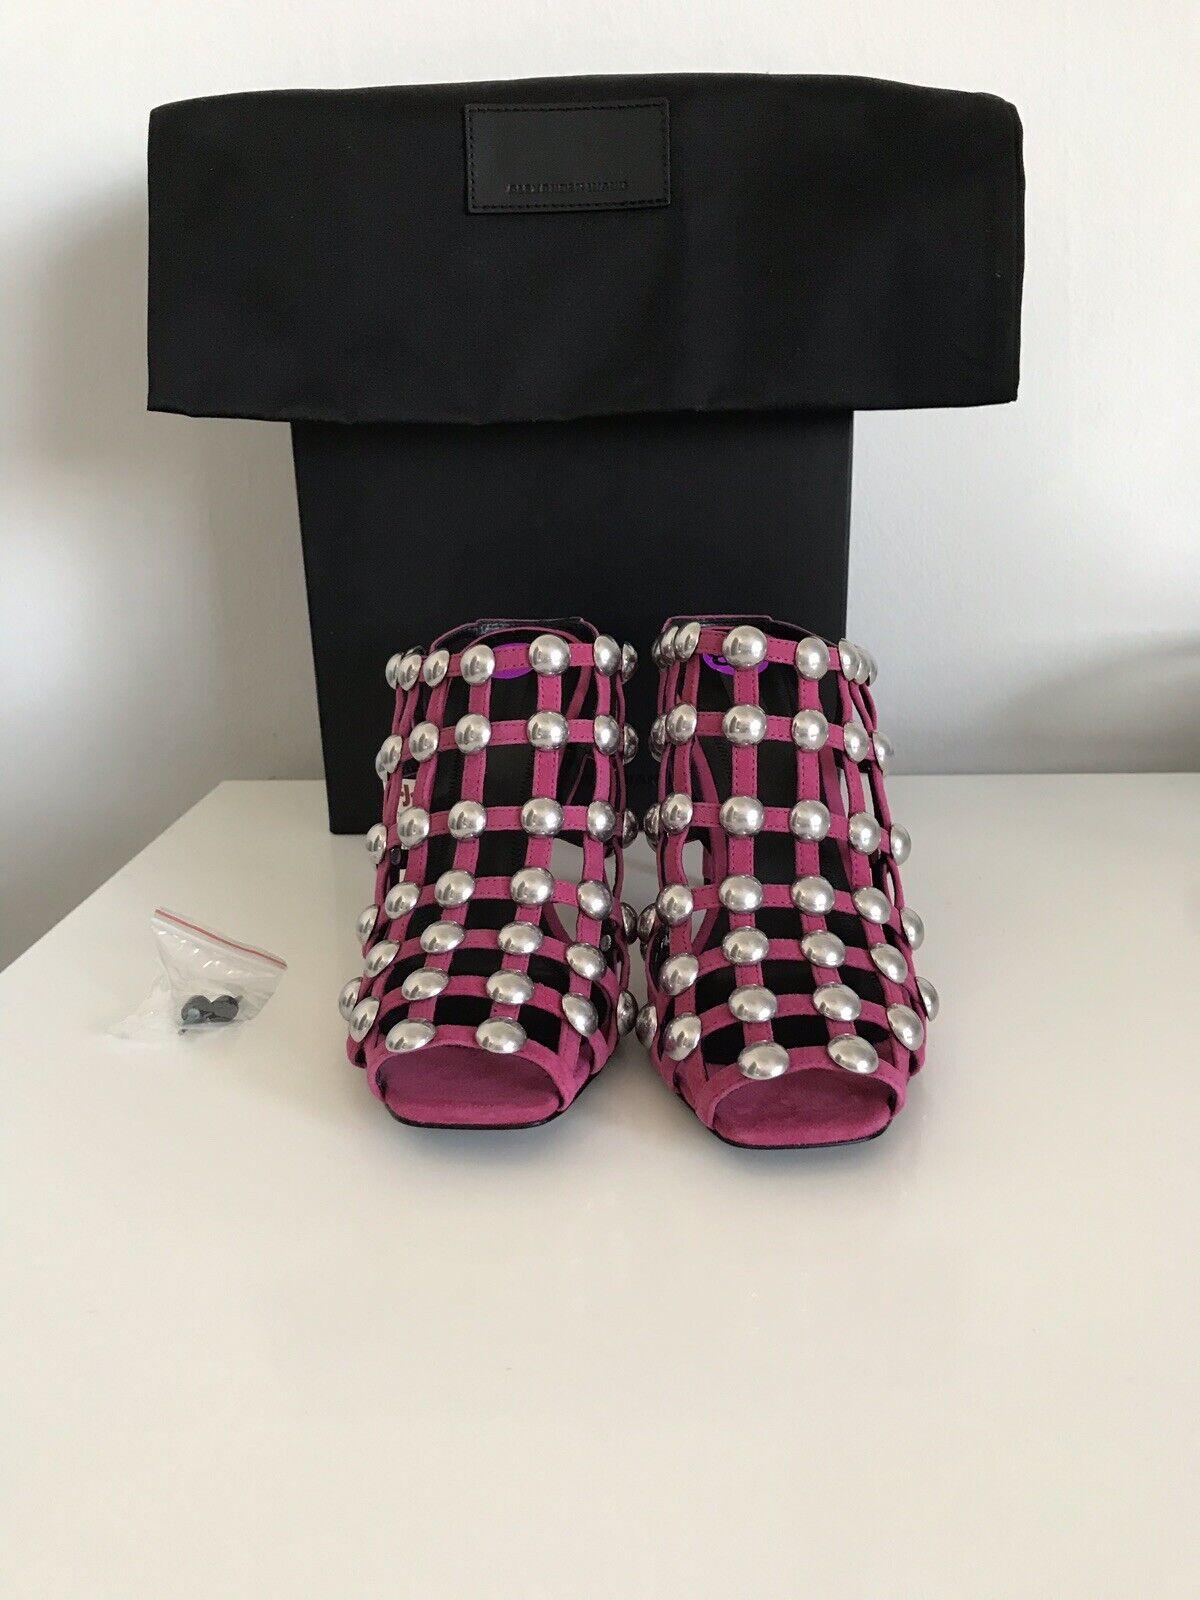 incredibili sconti NWB  650 ALEXANDER WANG SADIE FUCHSIA SUEDE rosa rosa rosa HEEL SANDALS scarpe SZ 38 1 2  promozioni di squadra